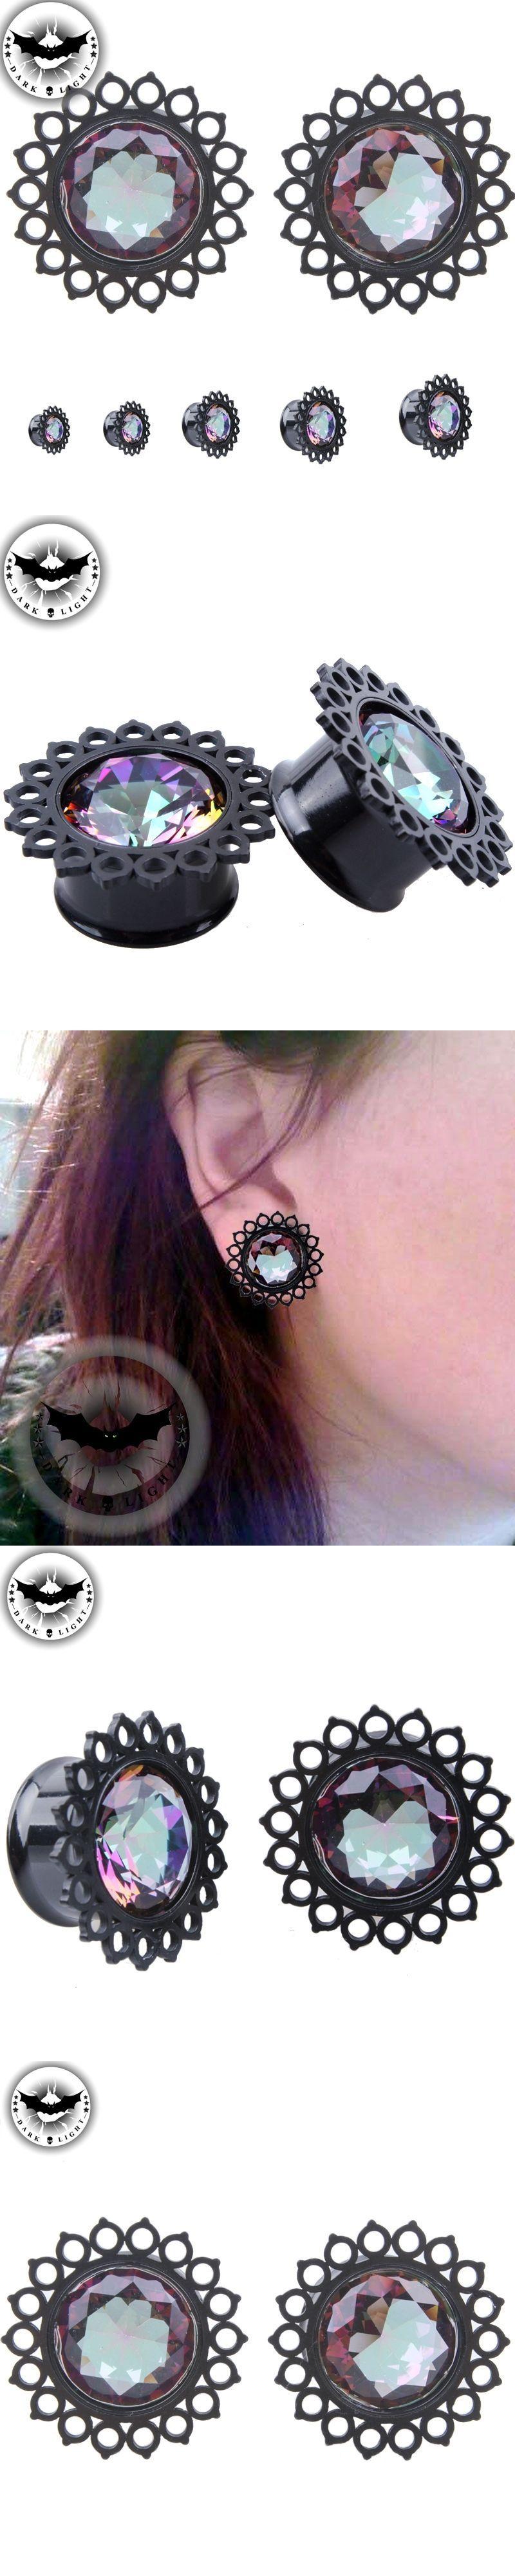 Body piercing earrings  Dark Light  Pair Stainless Steel Flesh Tunnels Ear Plugs Gauges